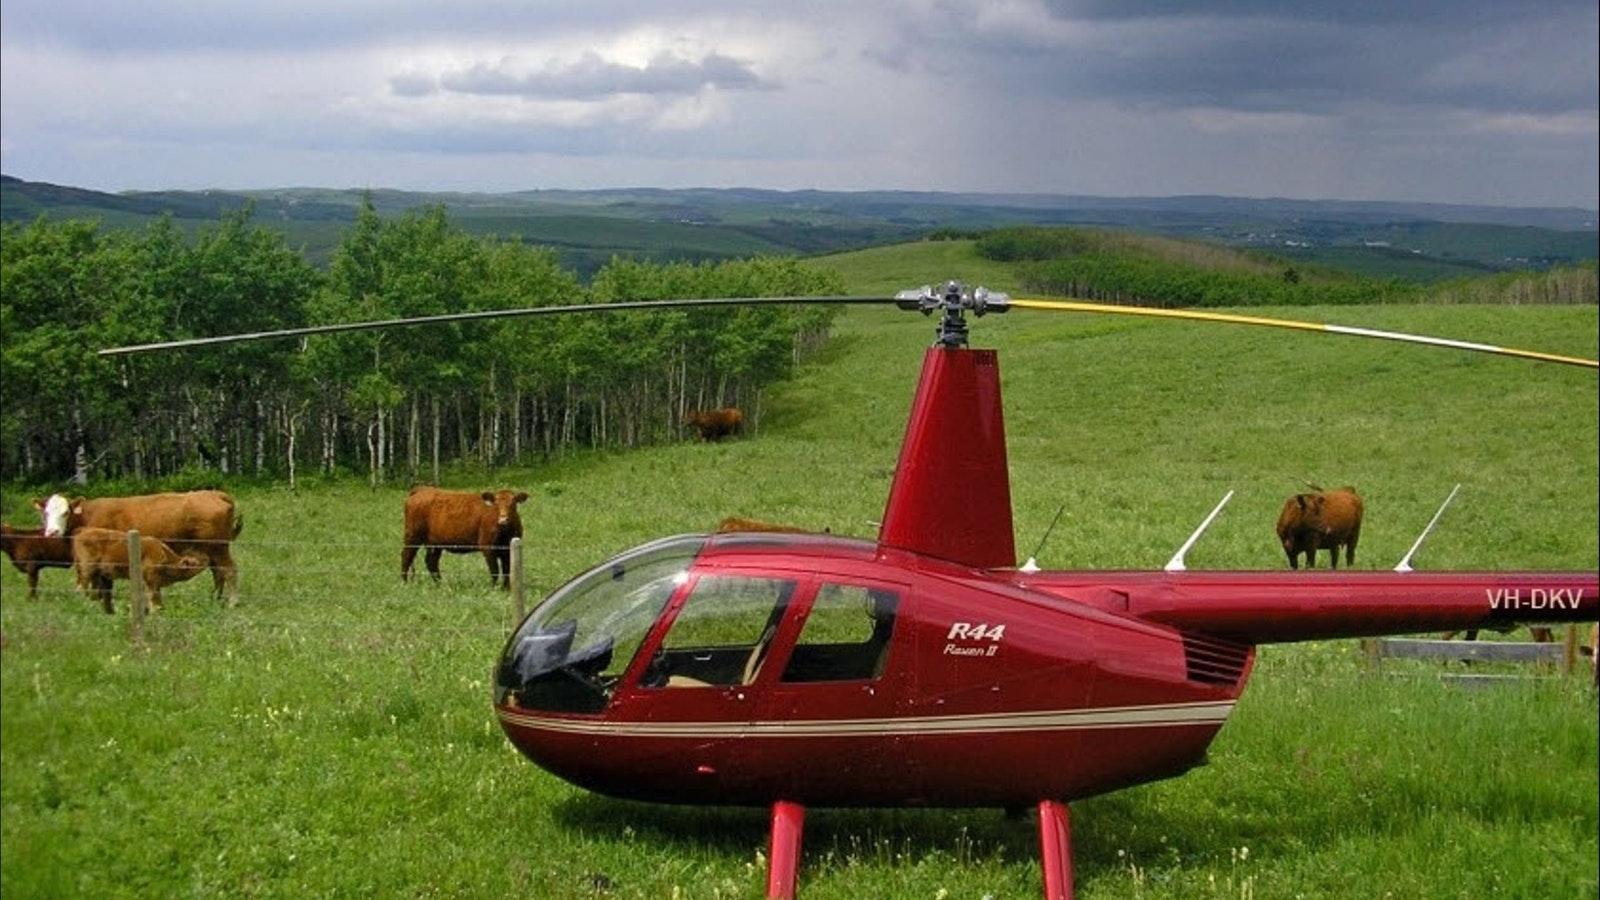 Robinson R44 VH-DKV